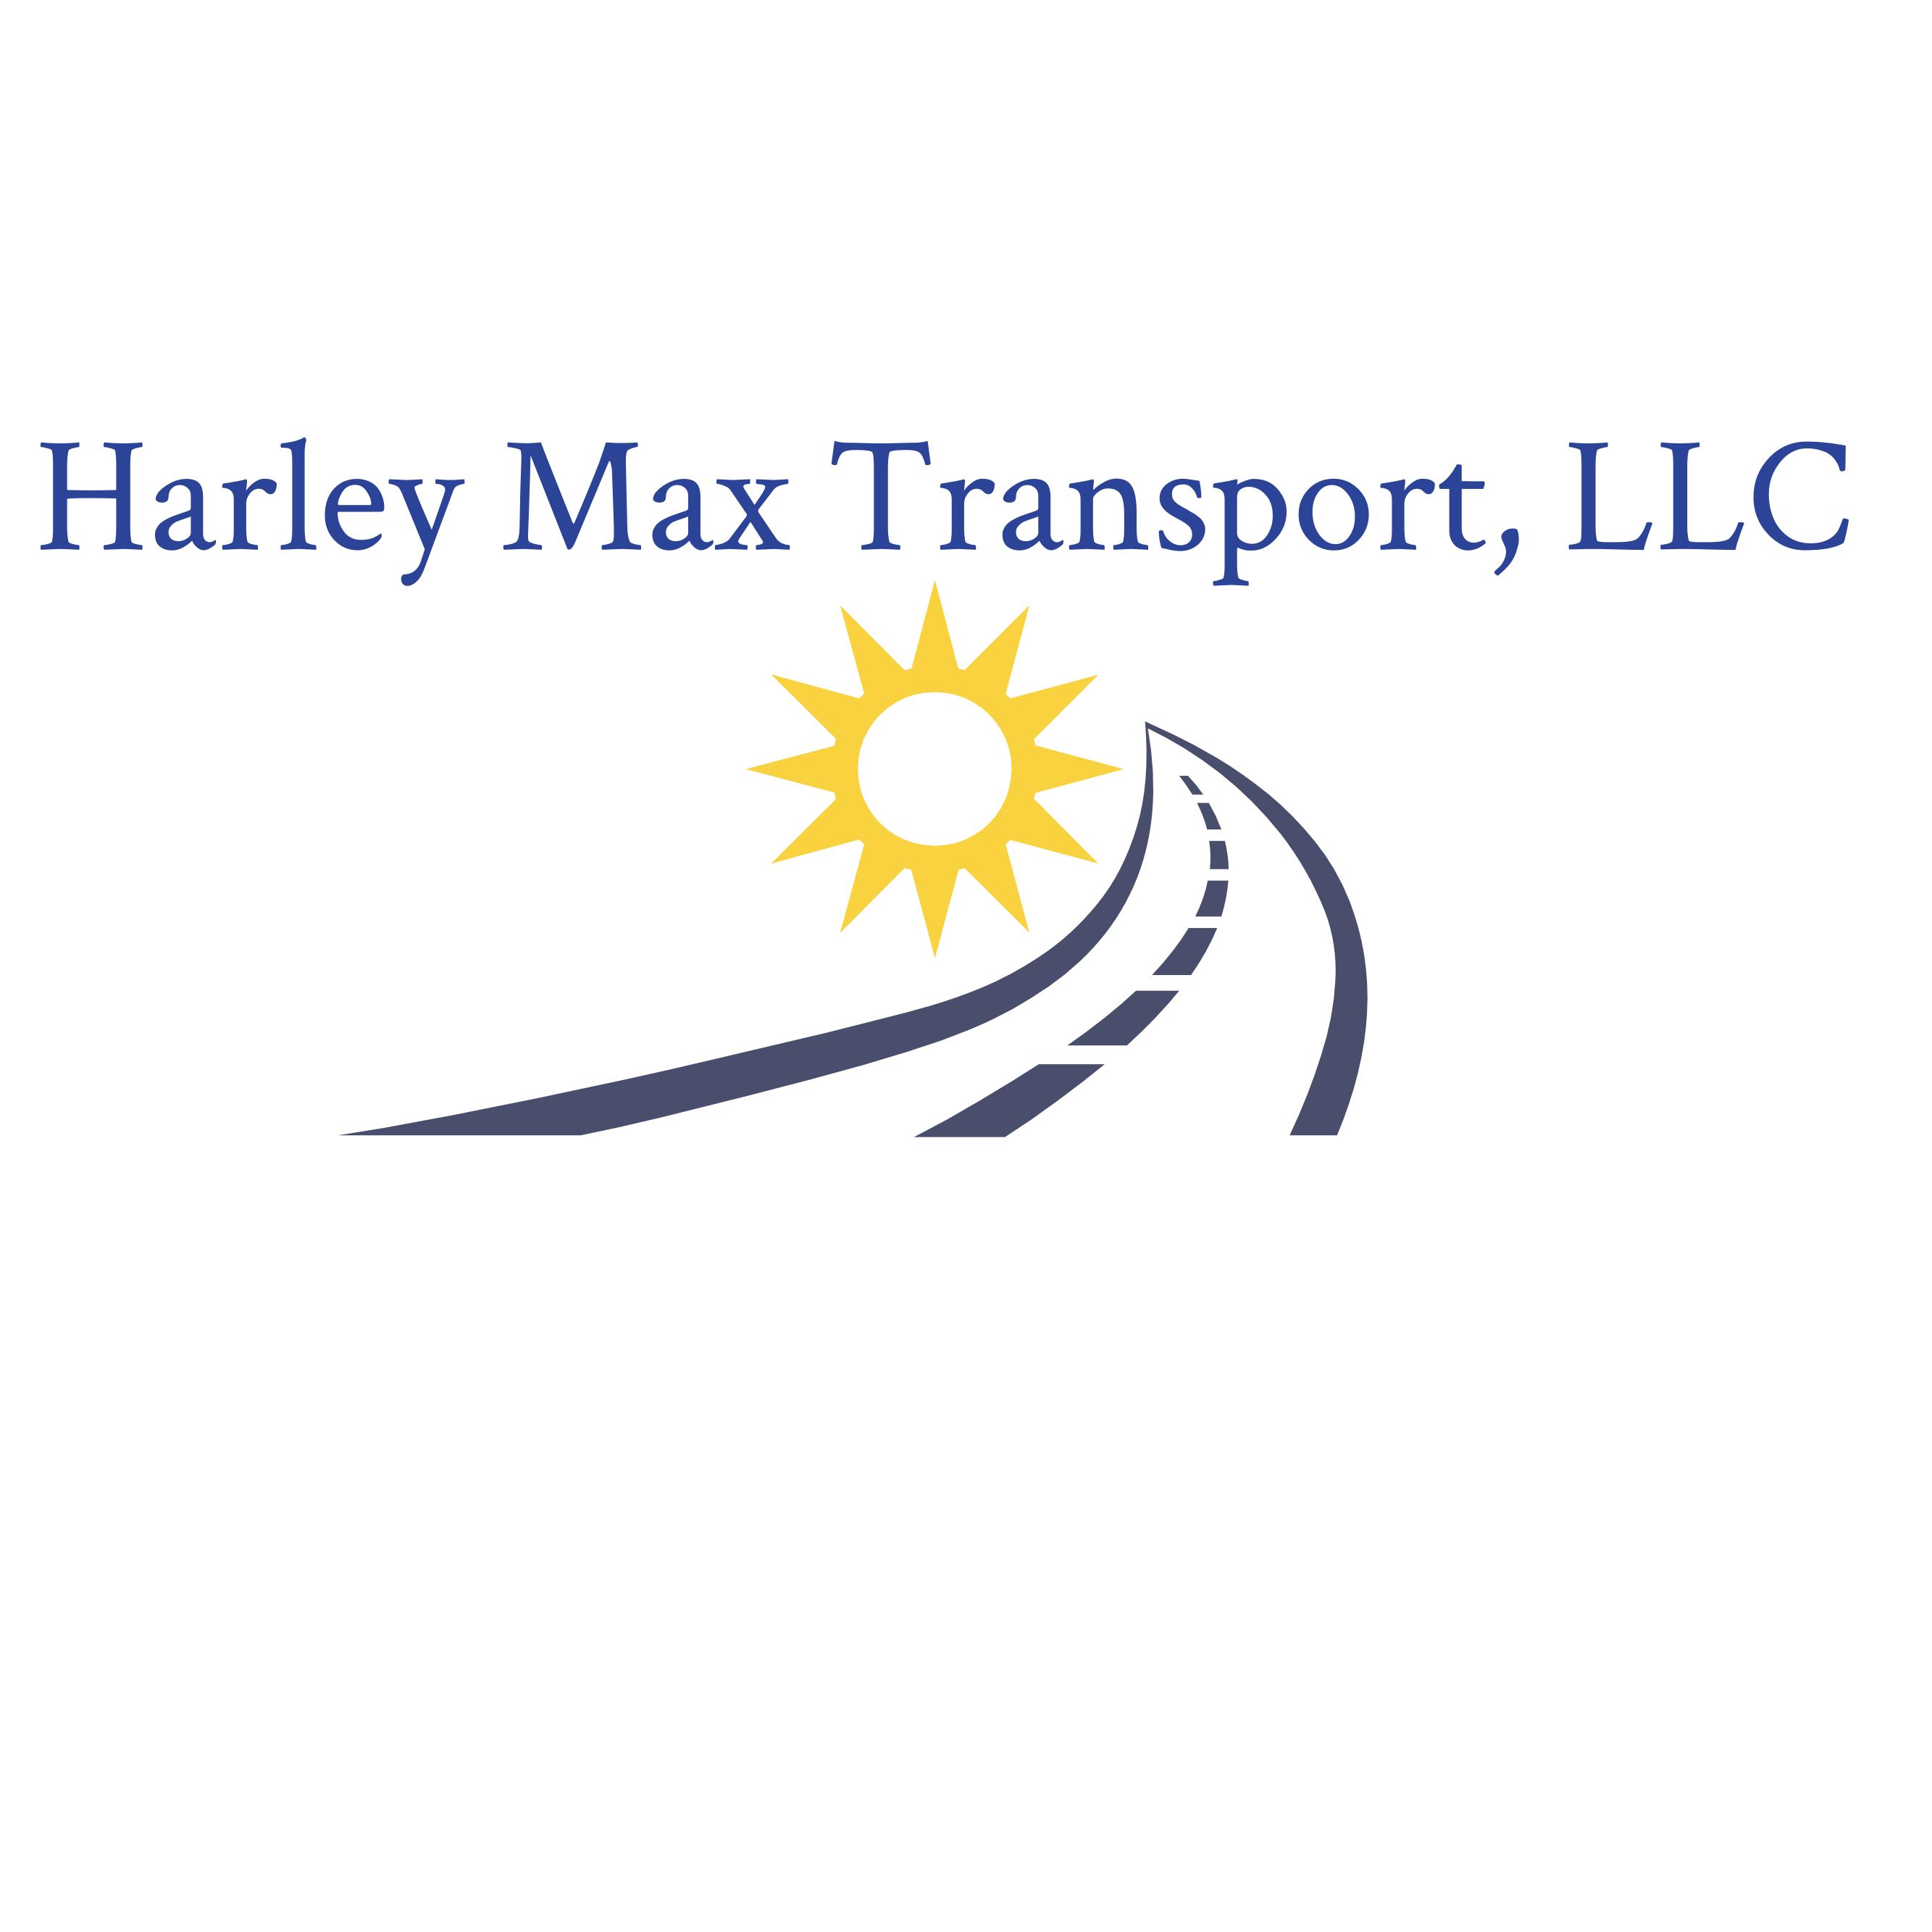 Harley Max Transport Llc In Cerritos Ca Whitepages